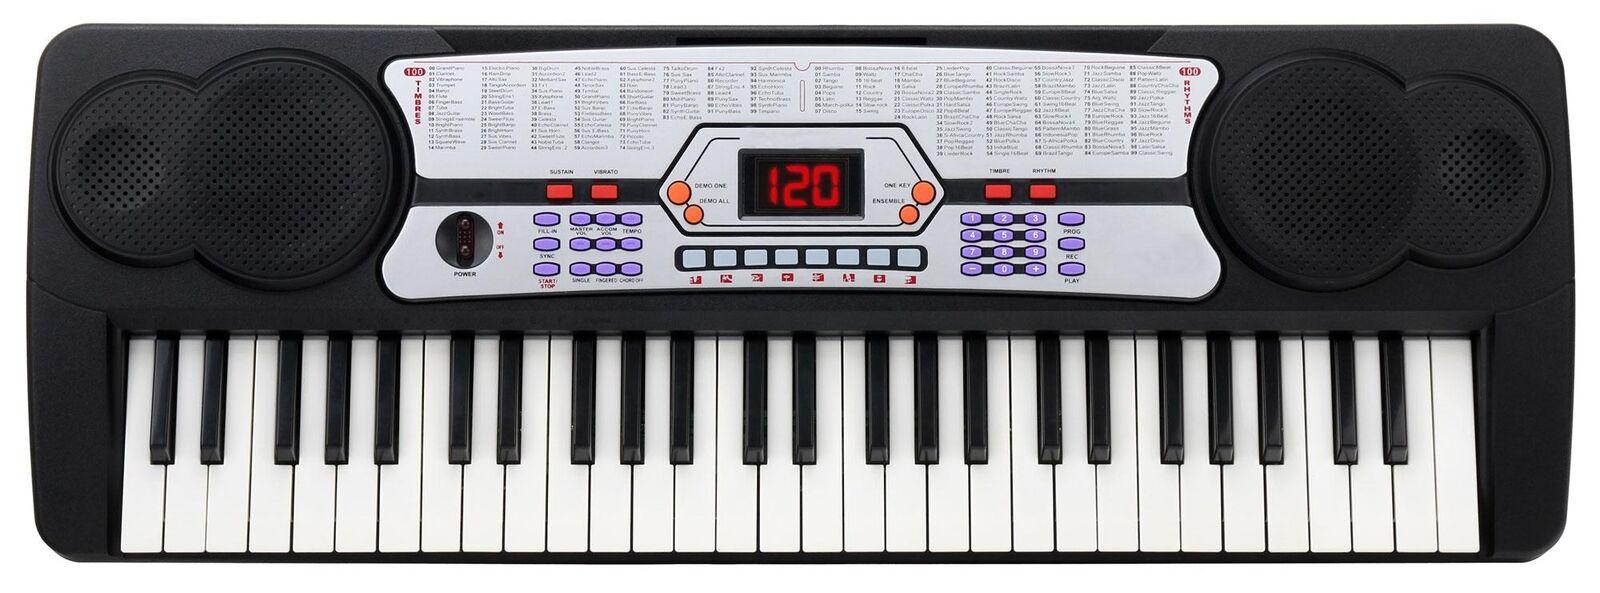 outlet online economico Digital 54 TASTI PRINCIPIANTI Keyboard Keyboard Keyboard E-pianoforte Klavier 100 suoni 100 ritmi  negozio all'ingrosso